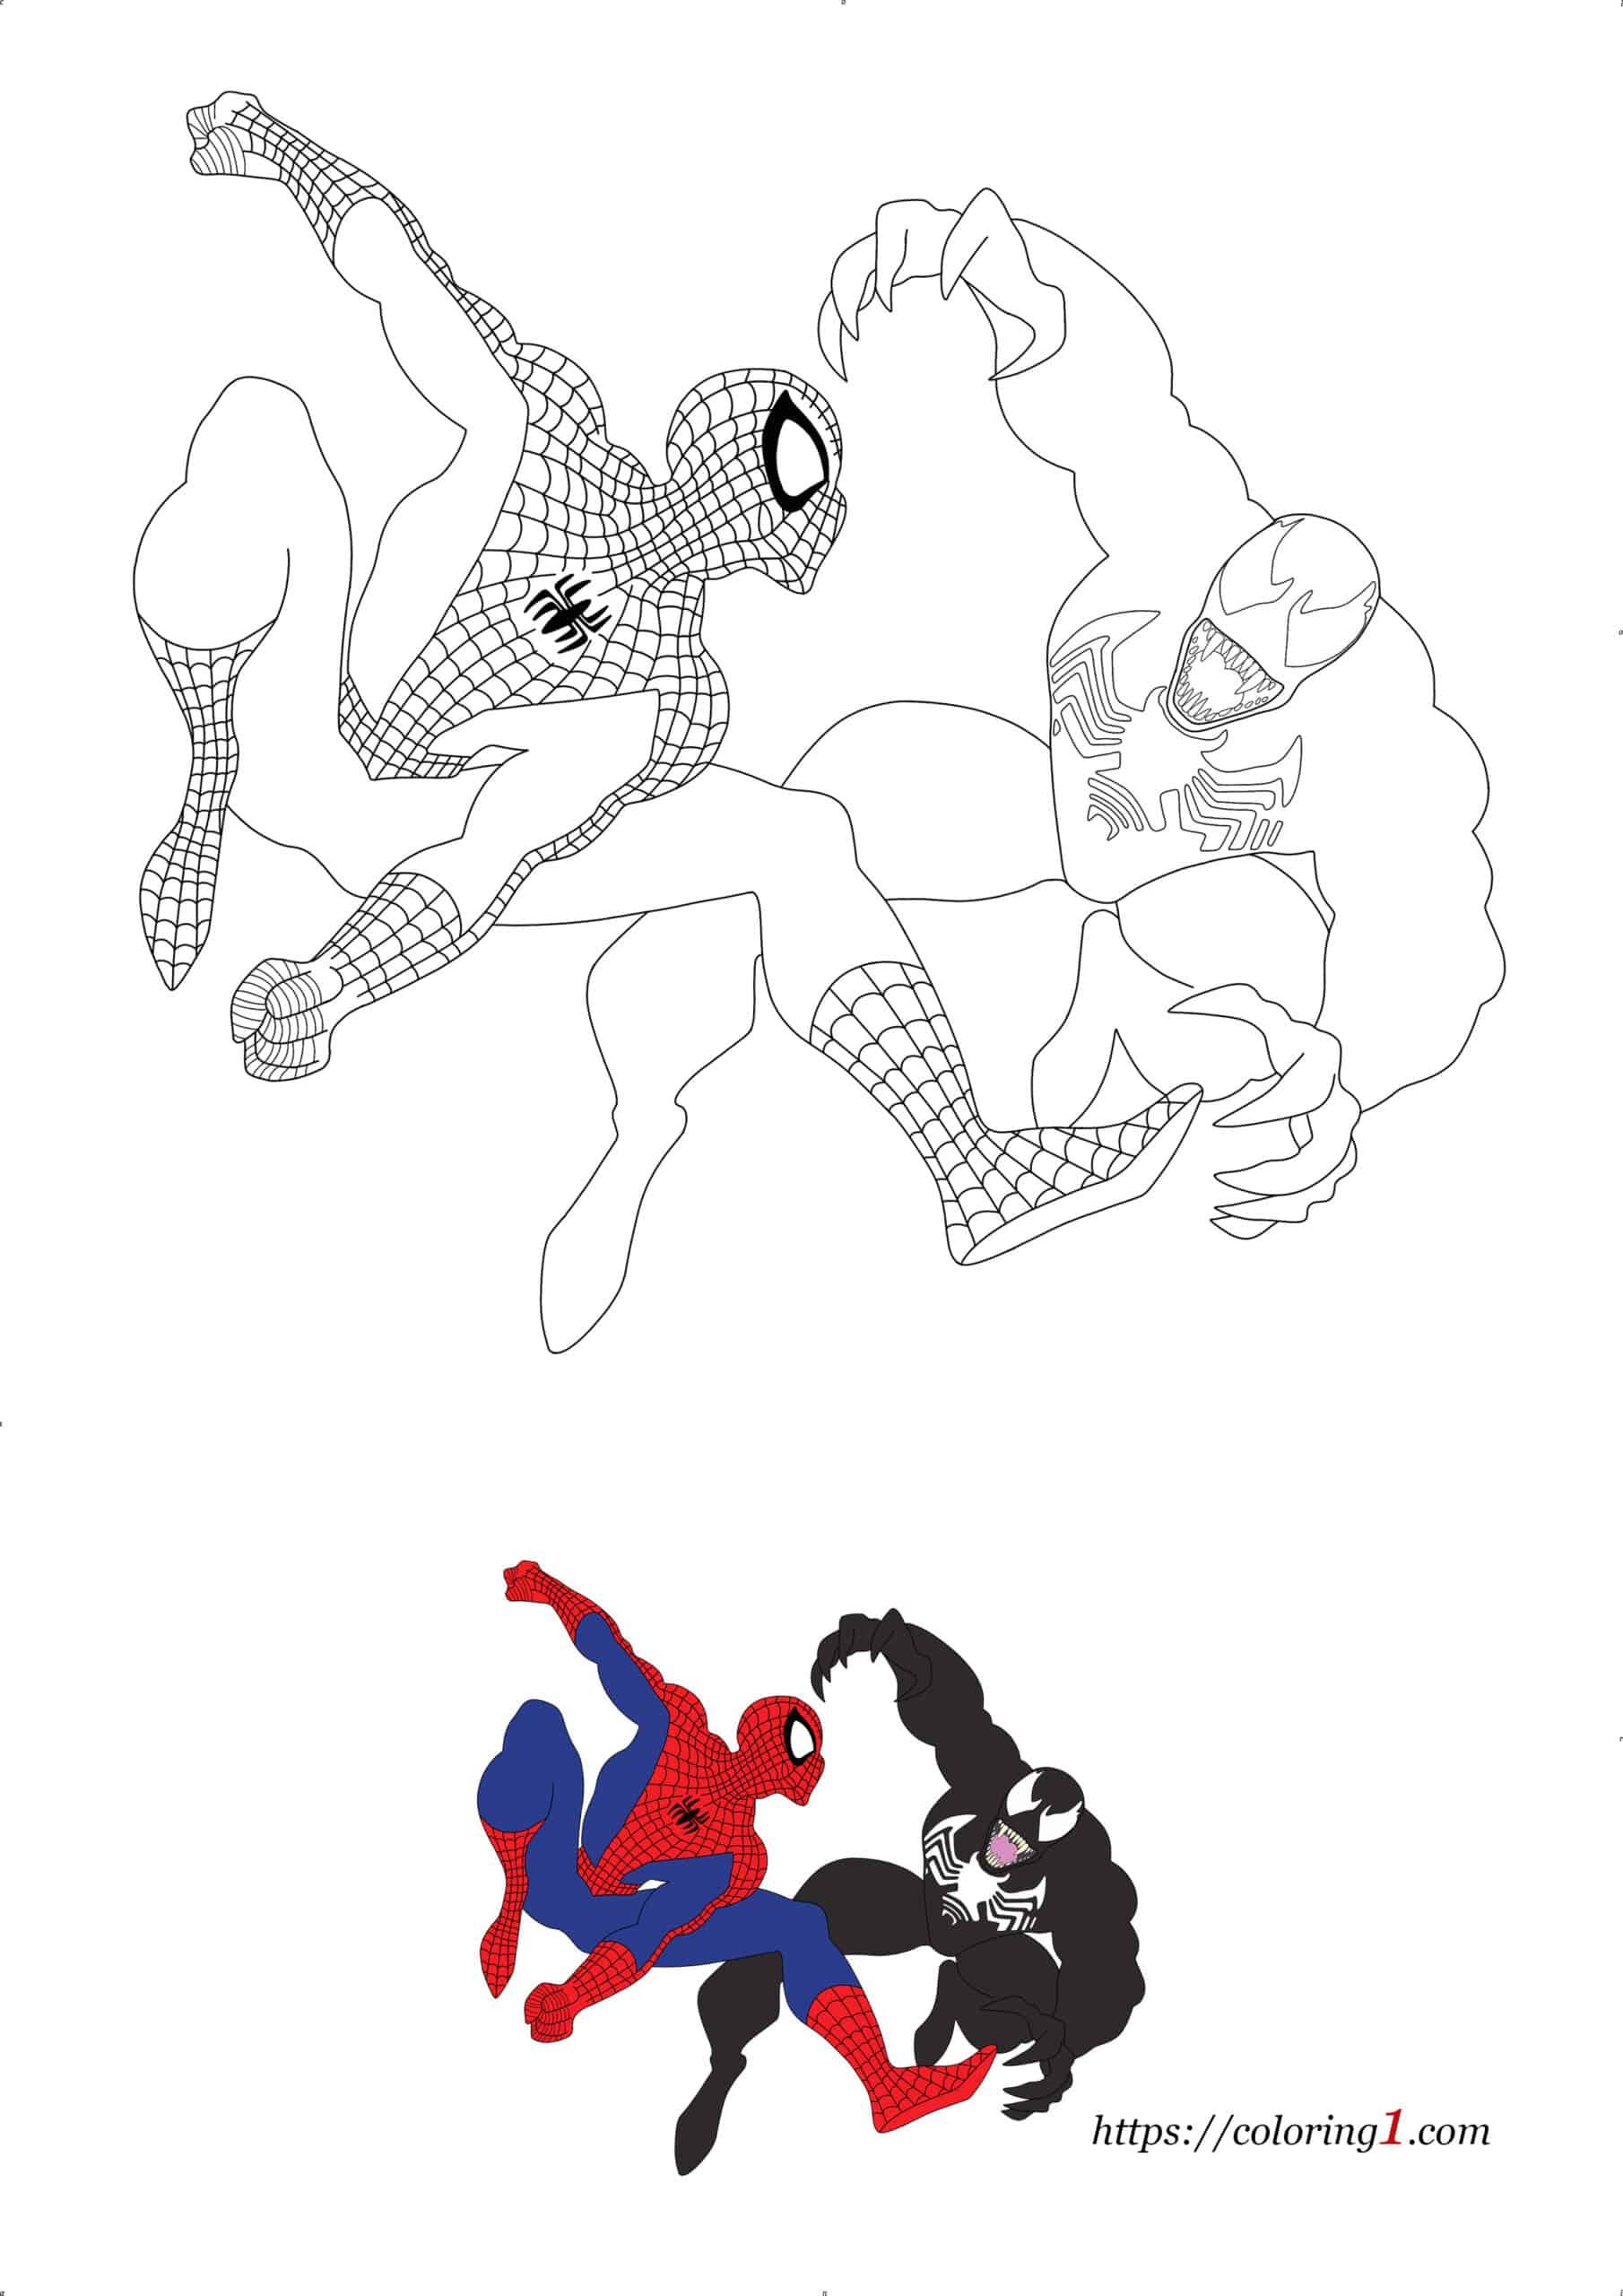 Venom vs Spiderman free printable coloring page for kids